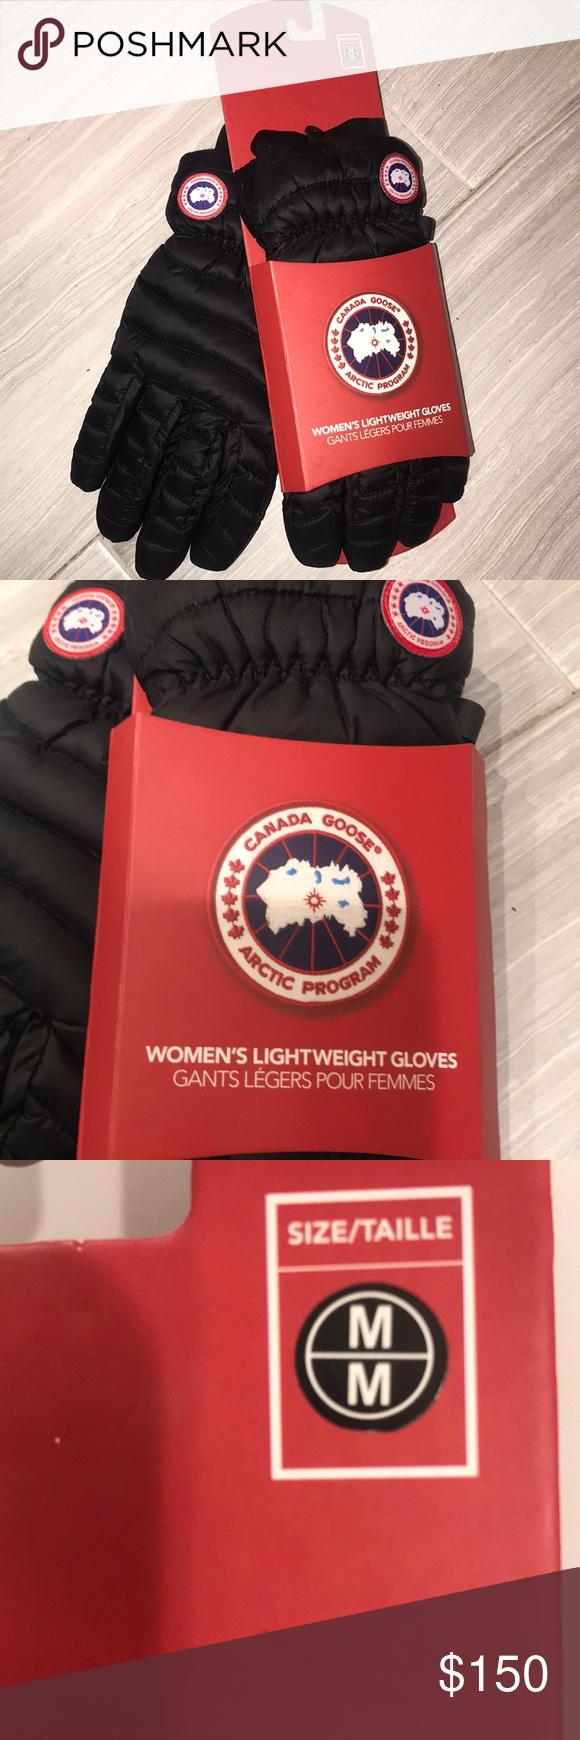 e28288554aa0 Canada Goose gloves Black Canada goose women s gloves   size medium M 6.5-7